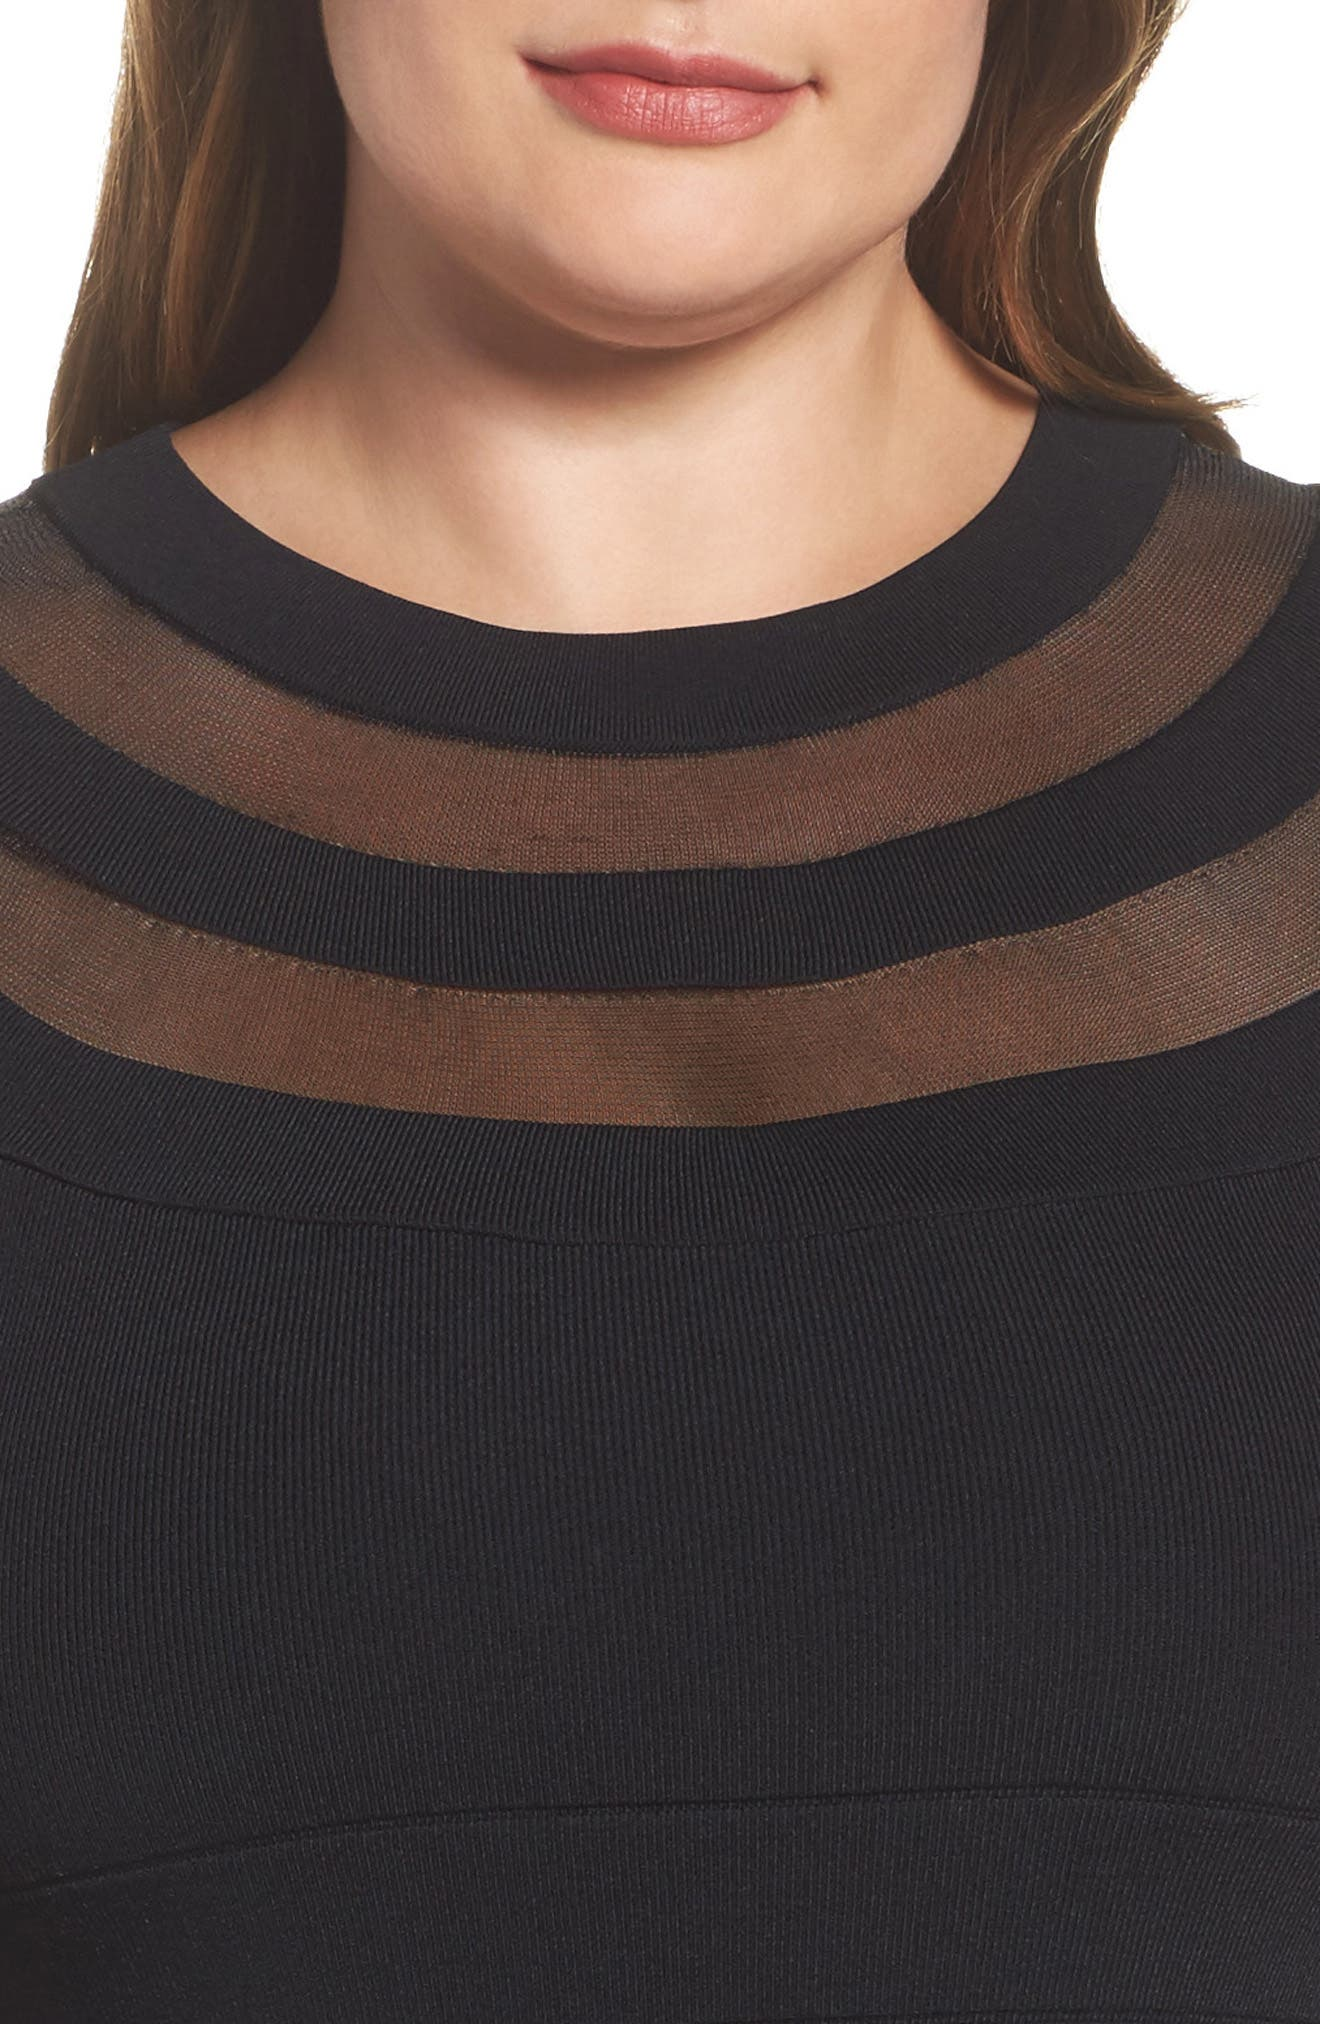 Sheer Inset Knit Sheath Dress,                             Alternate thumbnail 4, color,                             001